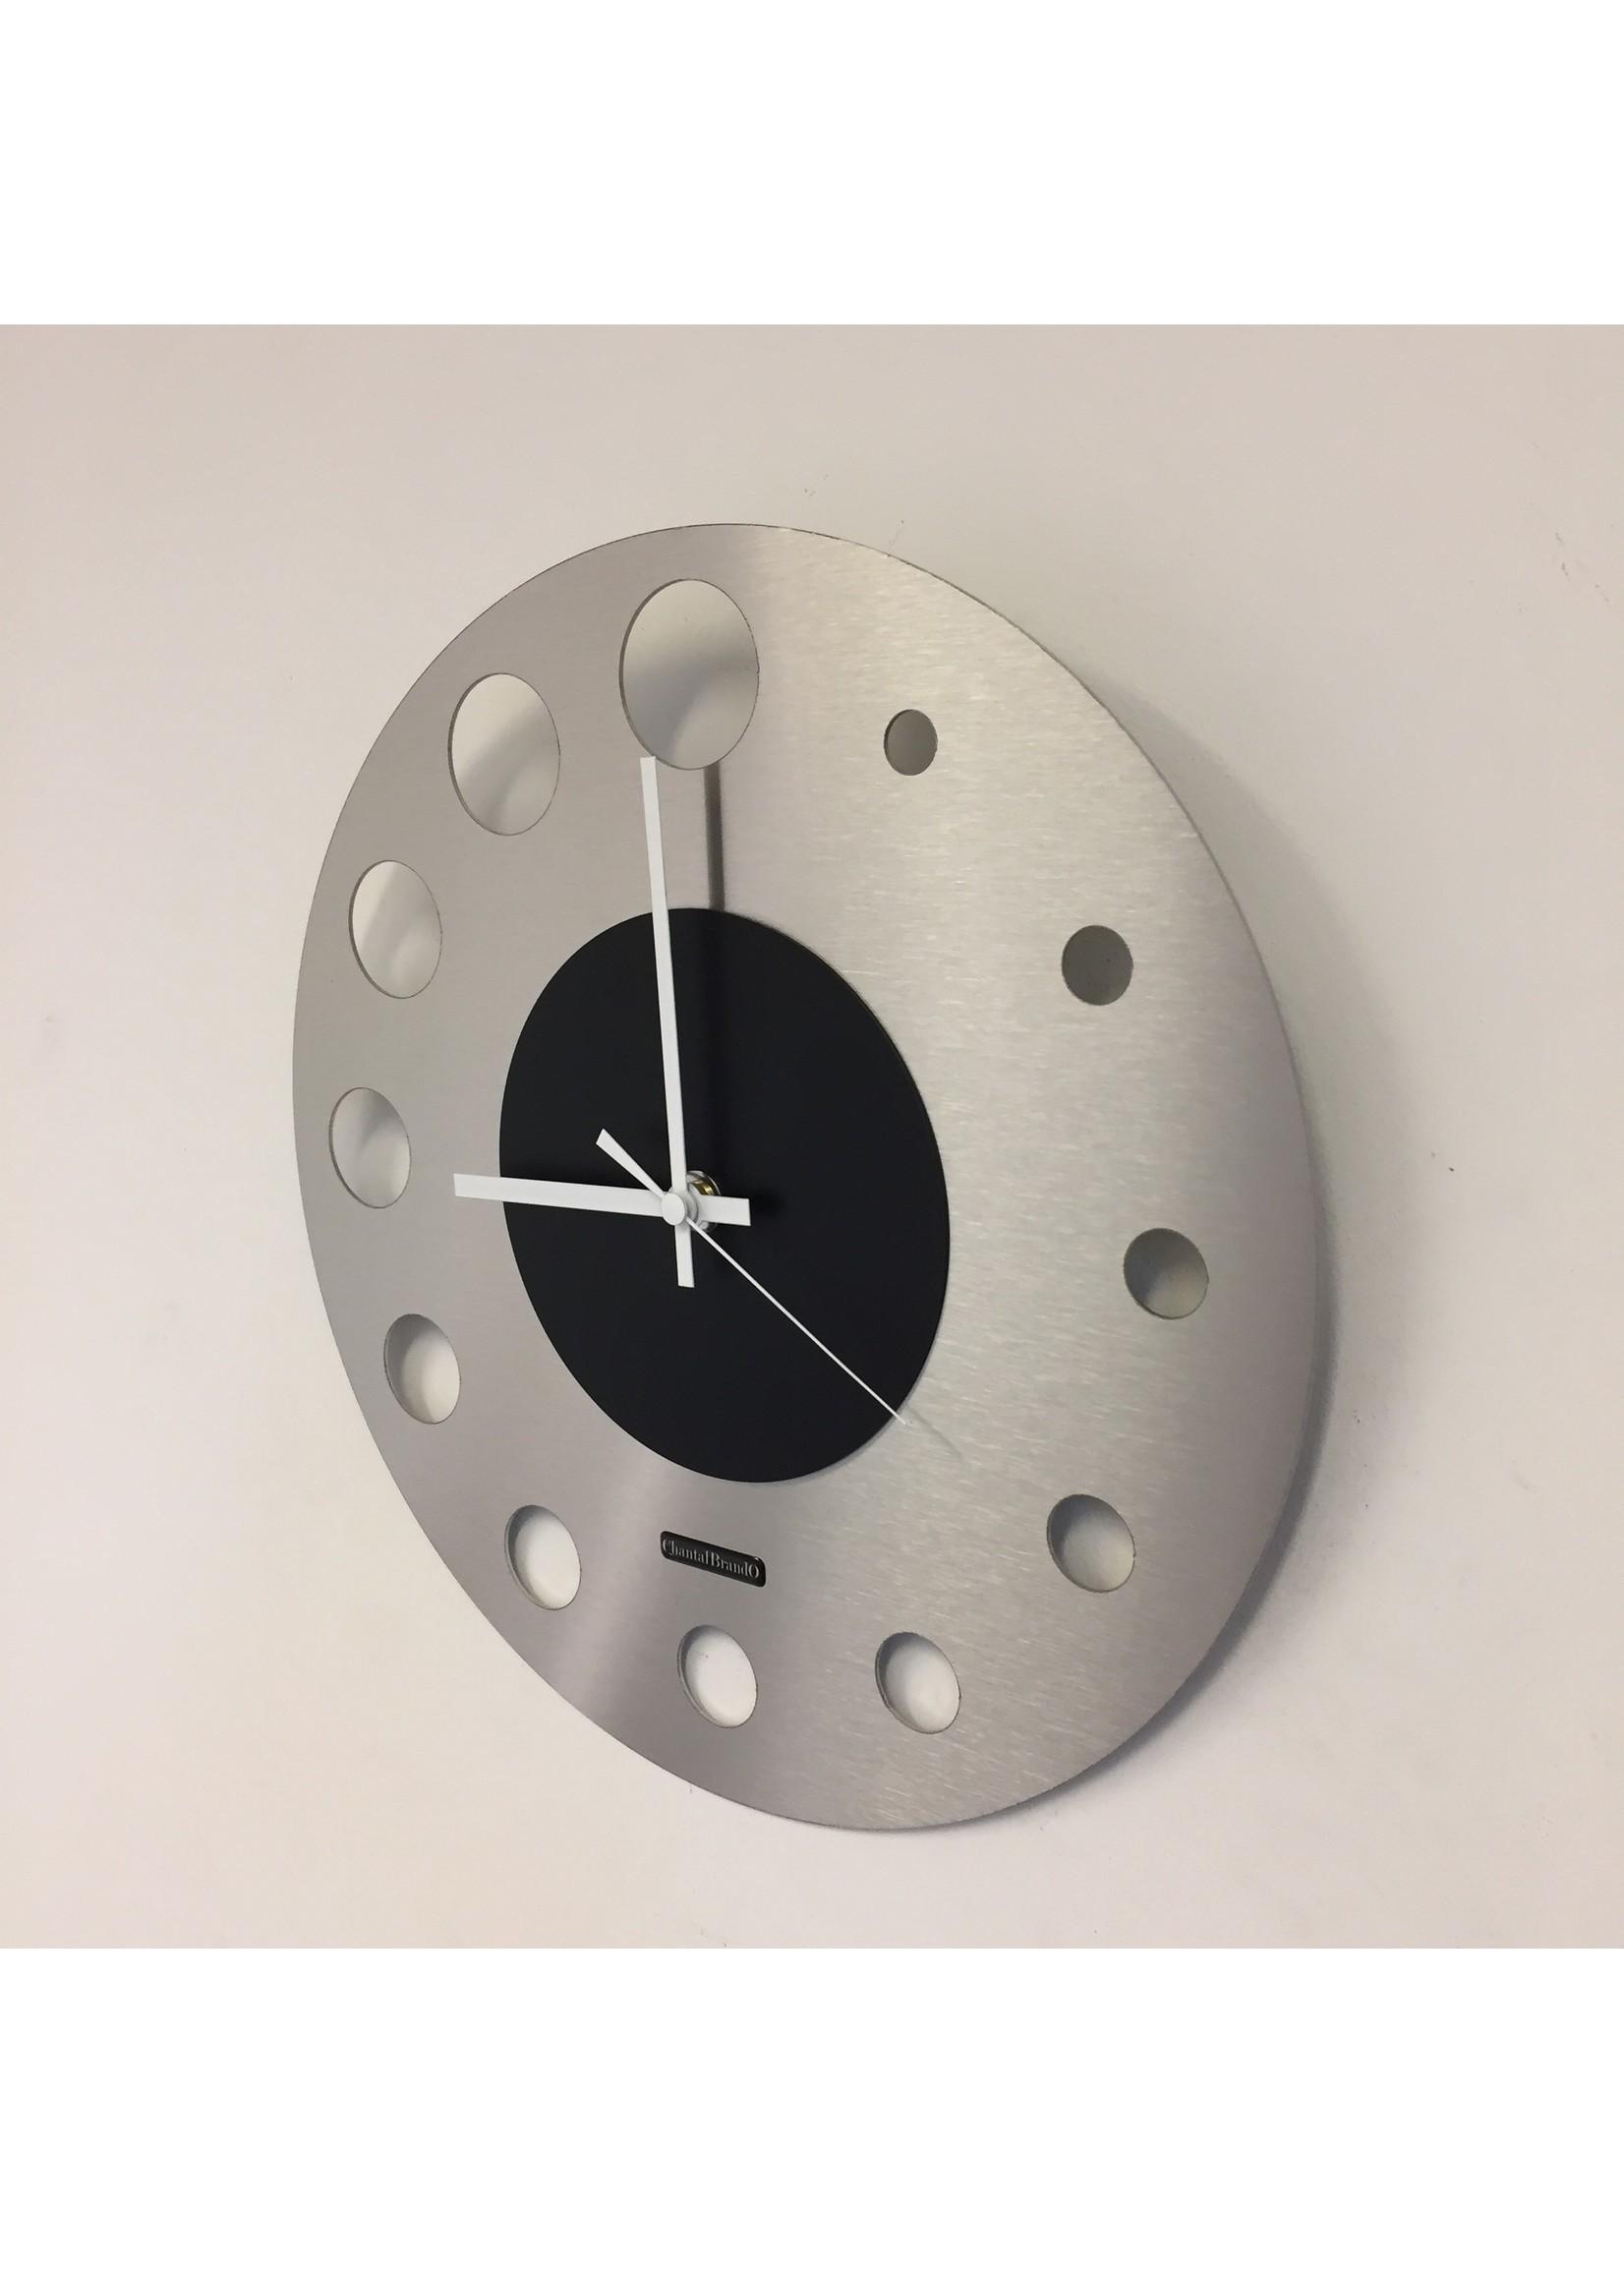 Klokkendiscounter Wandklok JUNTE BRUSSEL ATOMIUM Black Modern Design